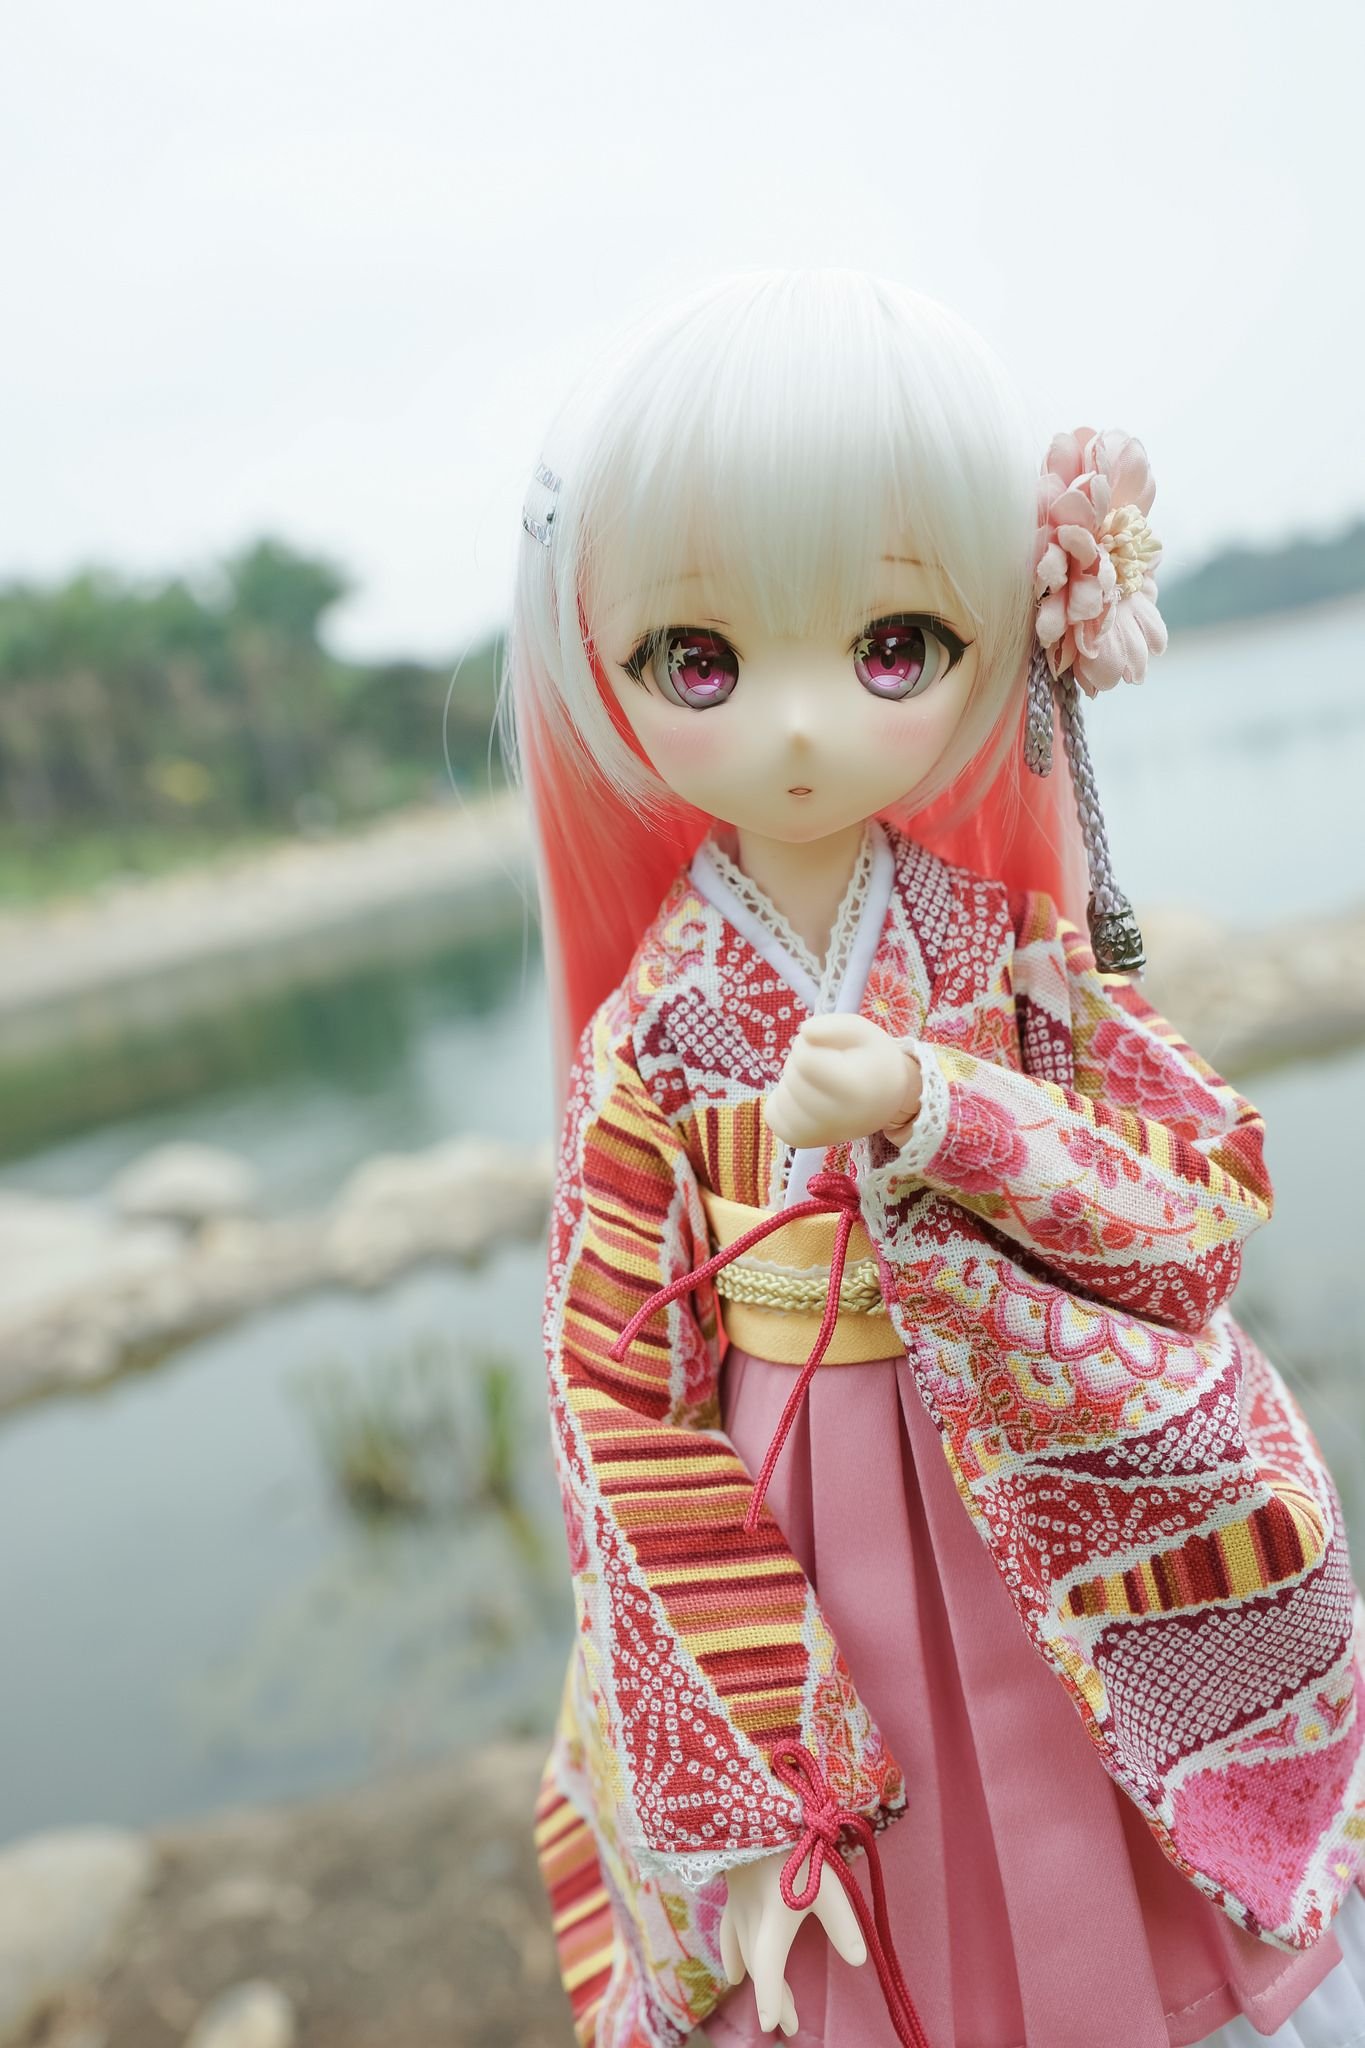 Dsc01610 anime dolls kawaii doll cute dolls